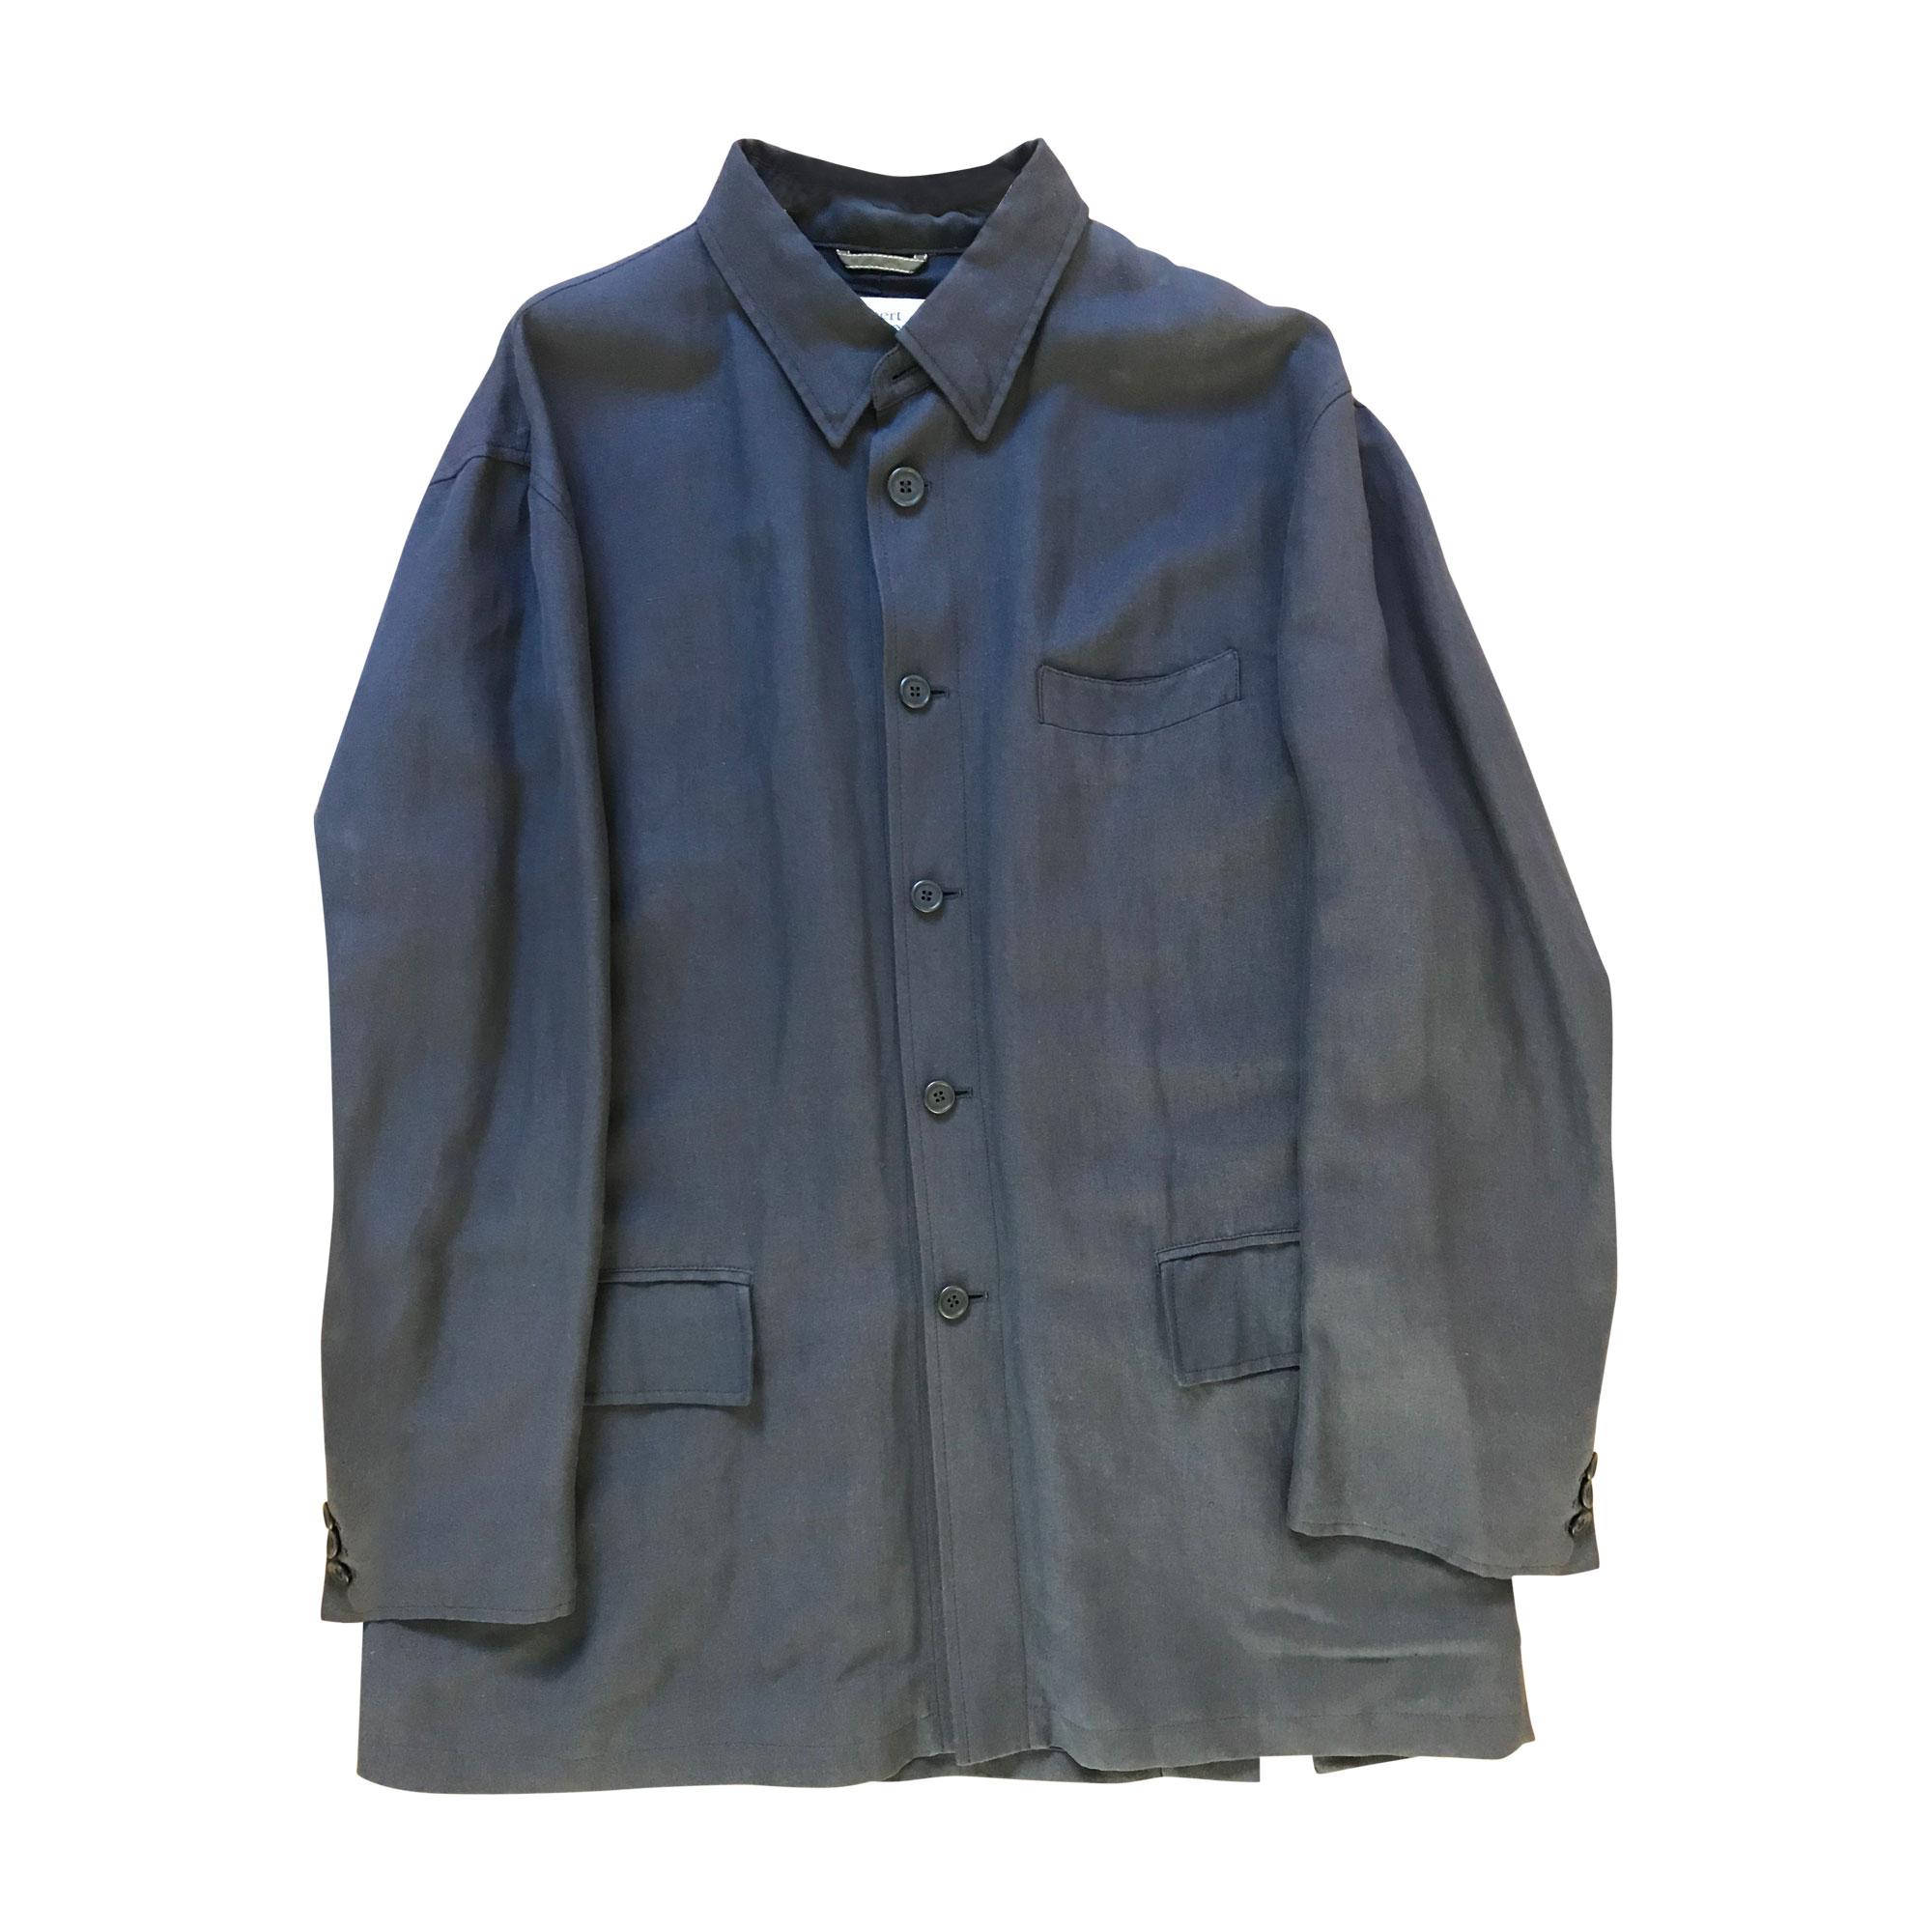 Veste FAÇONNABLE Bleu, bleu marine, bleu turquoise